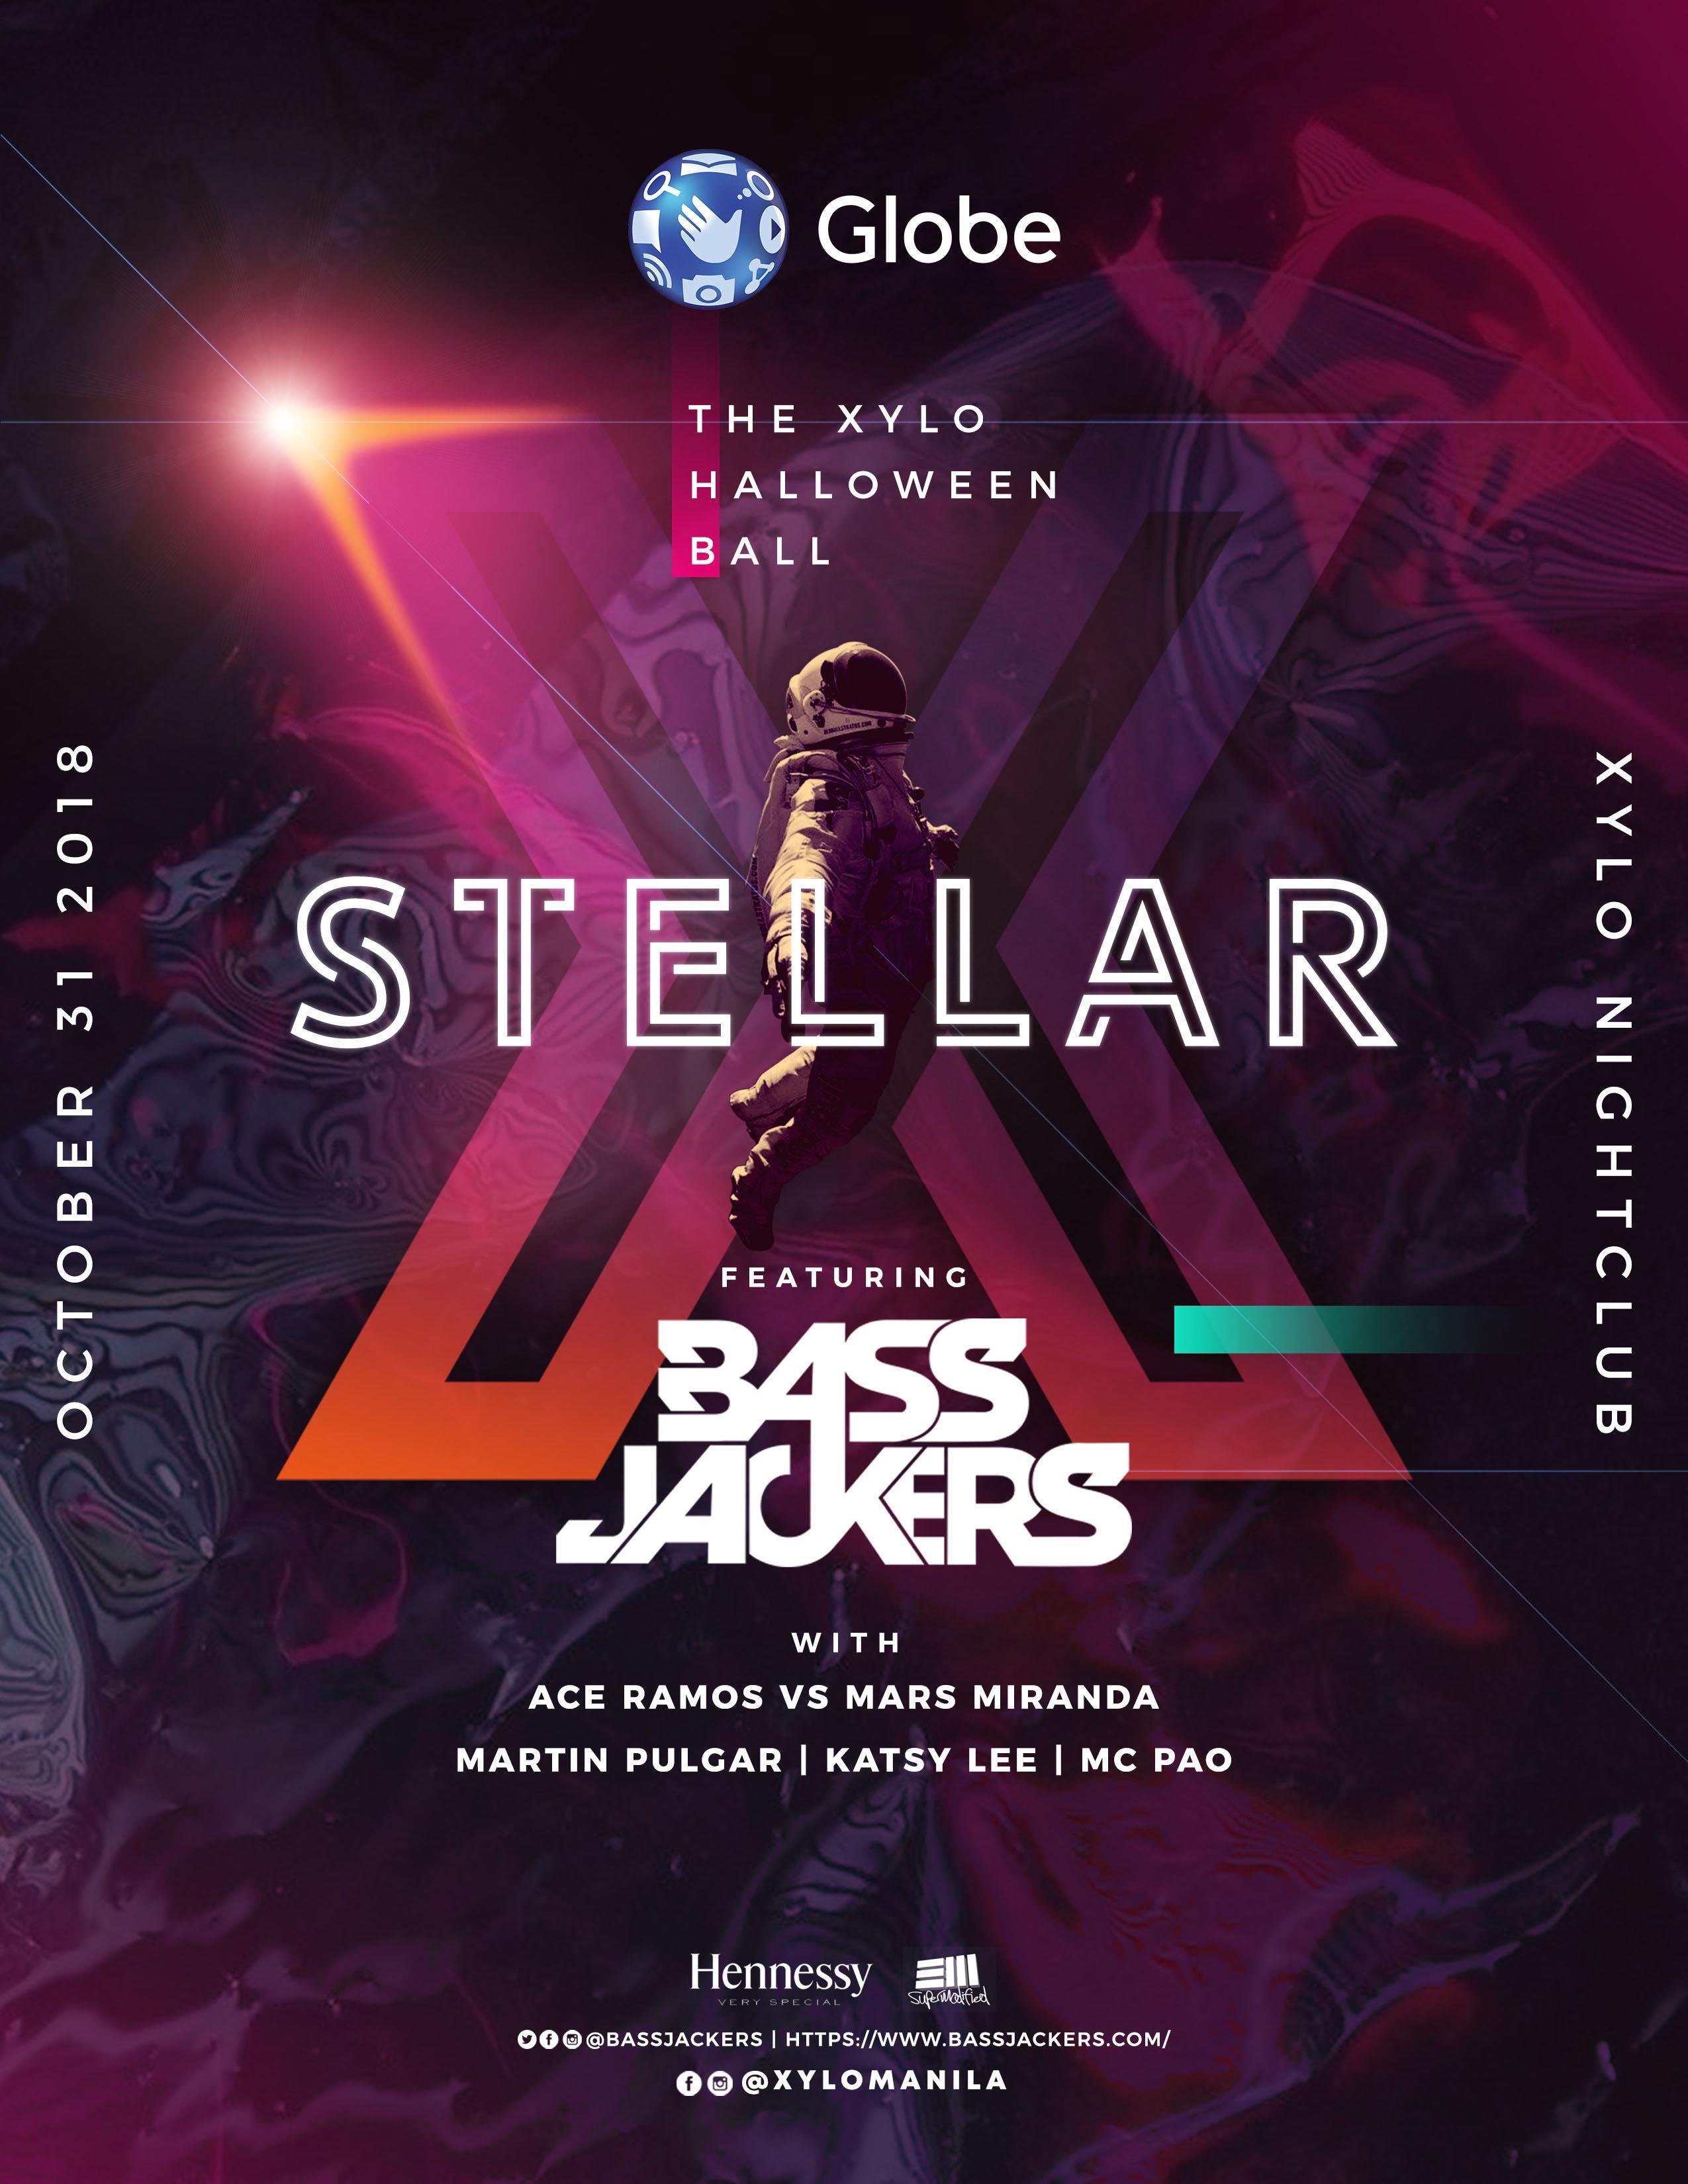 STELLAR - Xylo Nightclub Halloween Ball with Bassjackers